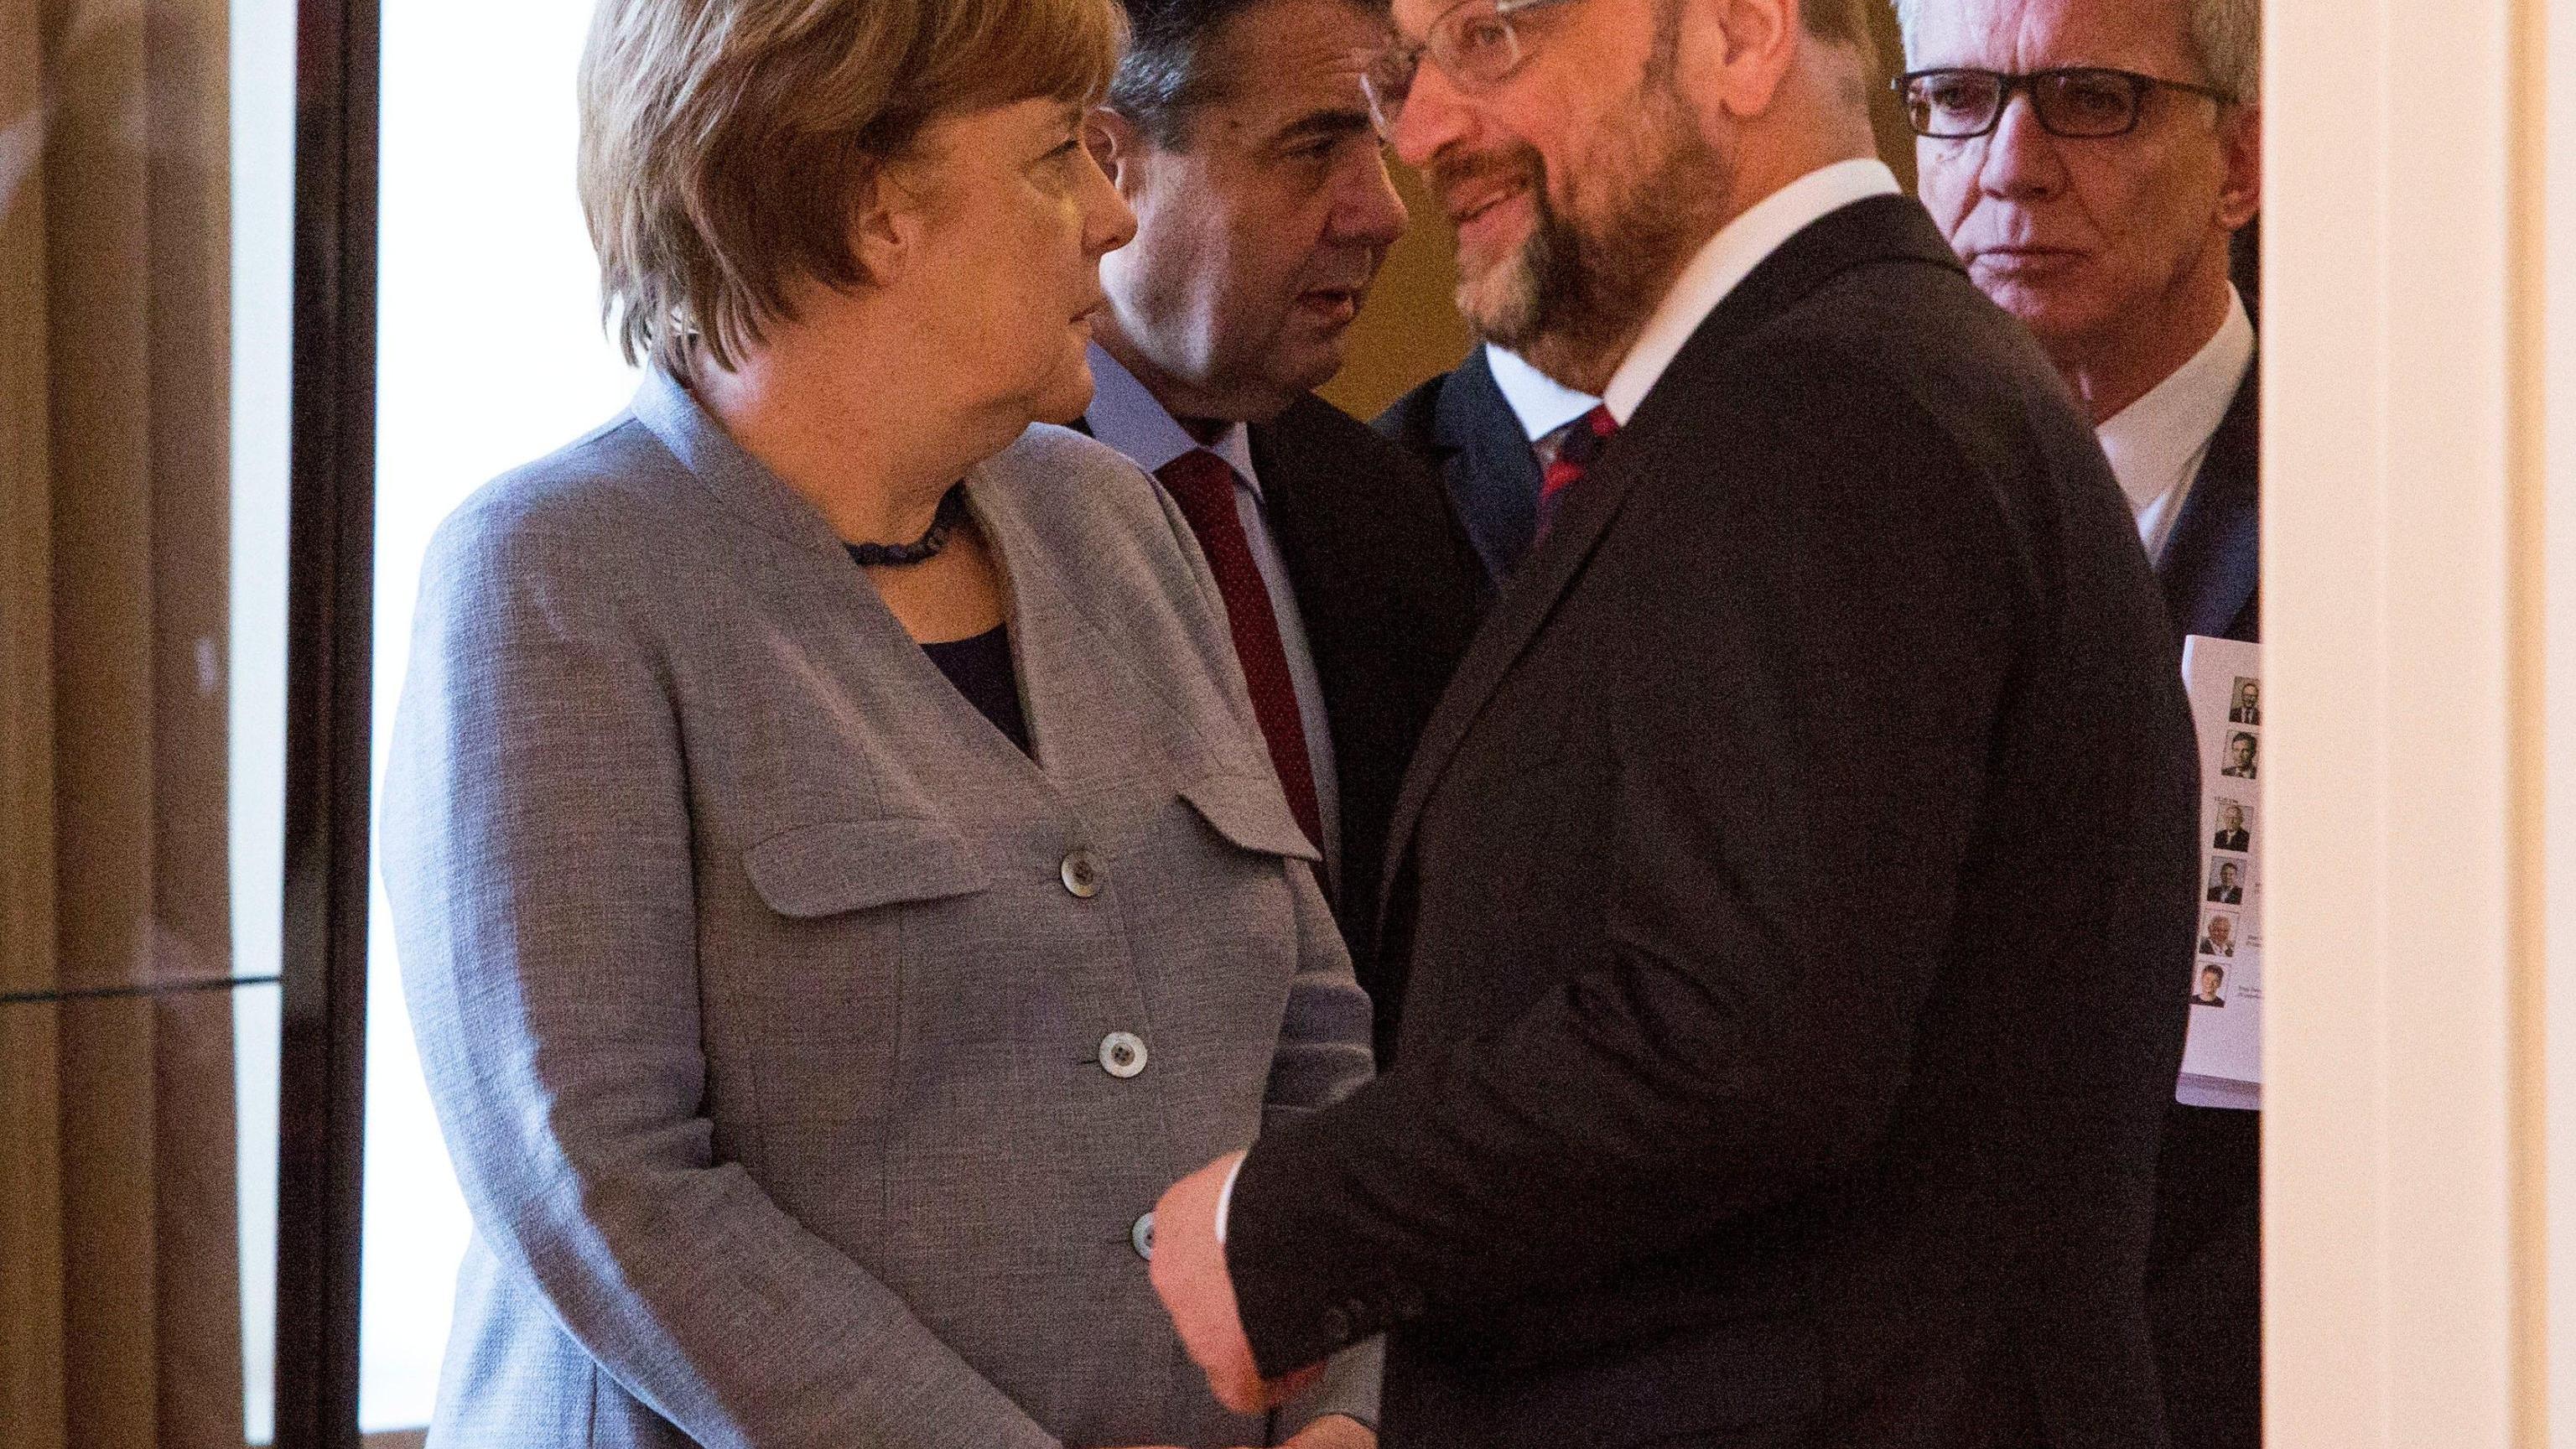 Germania: accordo per Grosse-Koalition